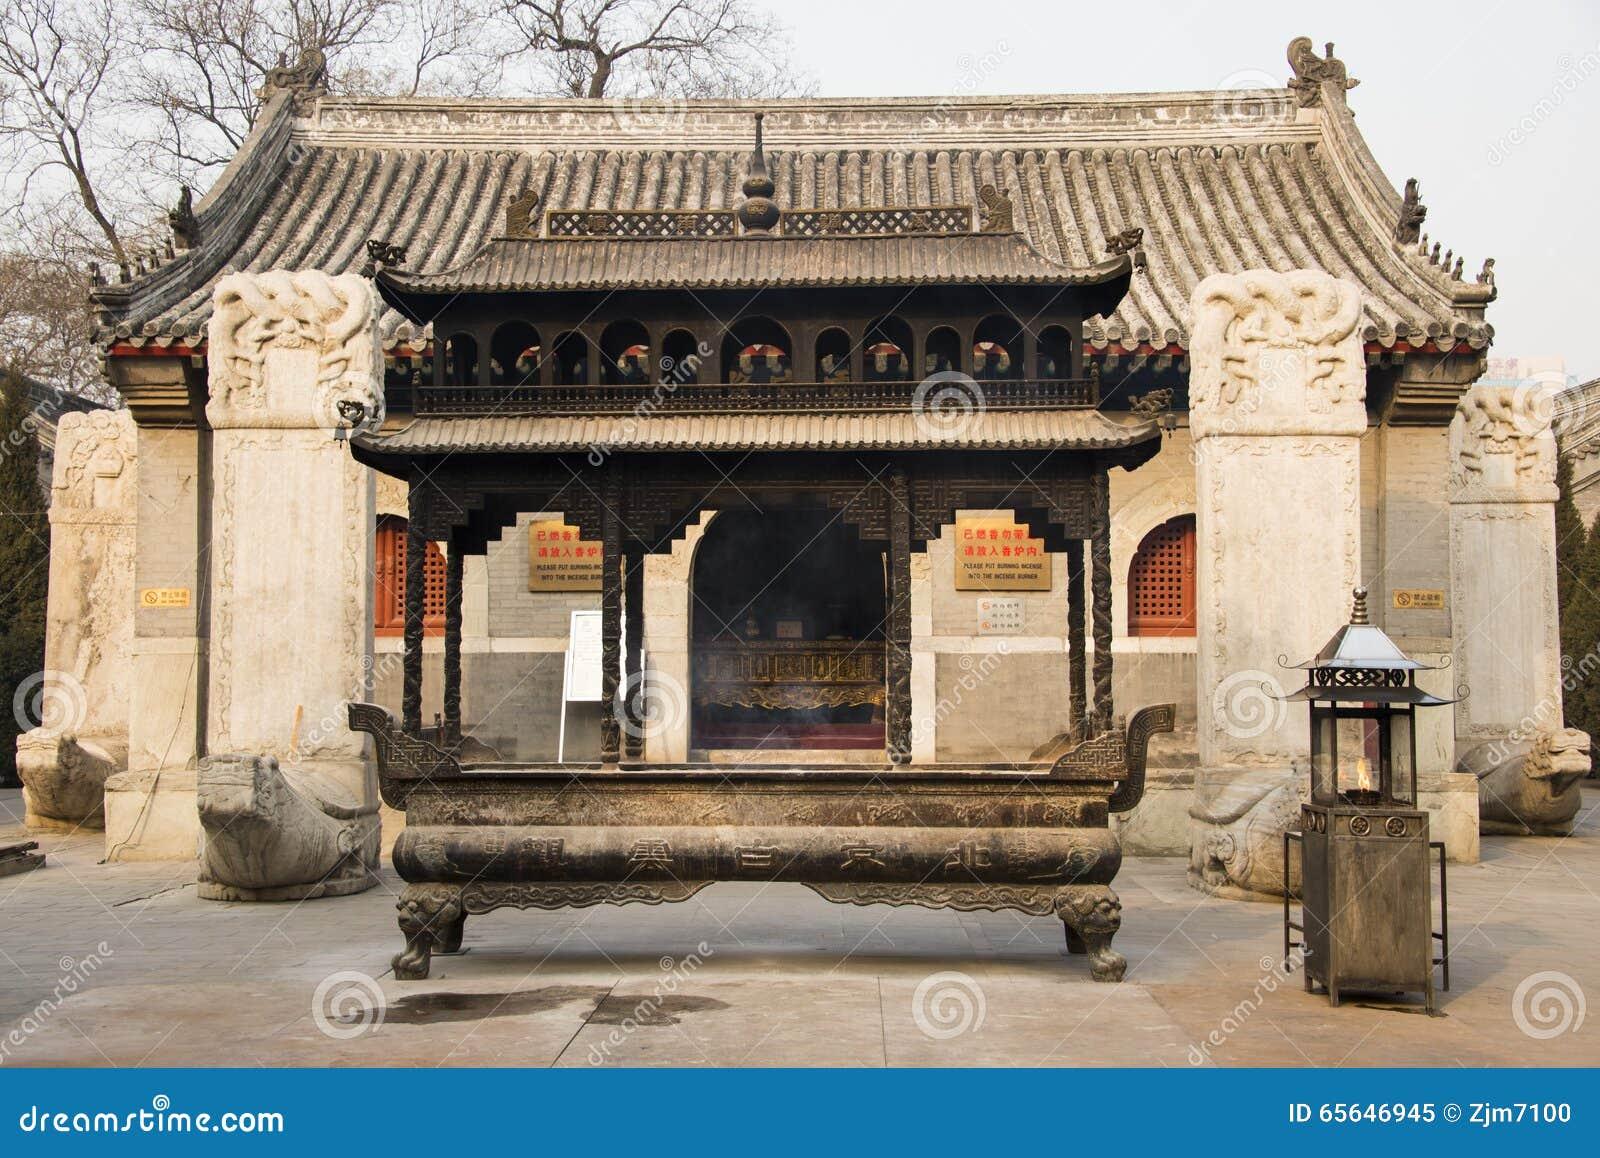 Азия Китай, Пекин, архитектура ŒLandscape ¼ spotï White Cloud Temple сценарная